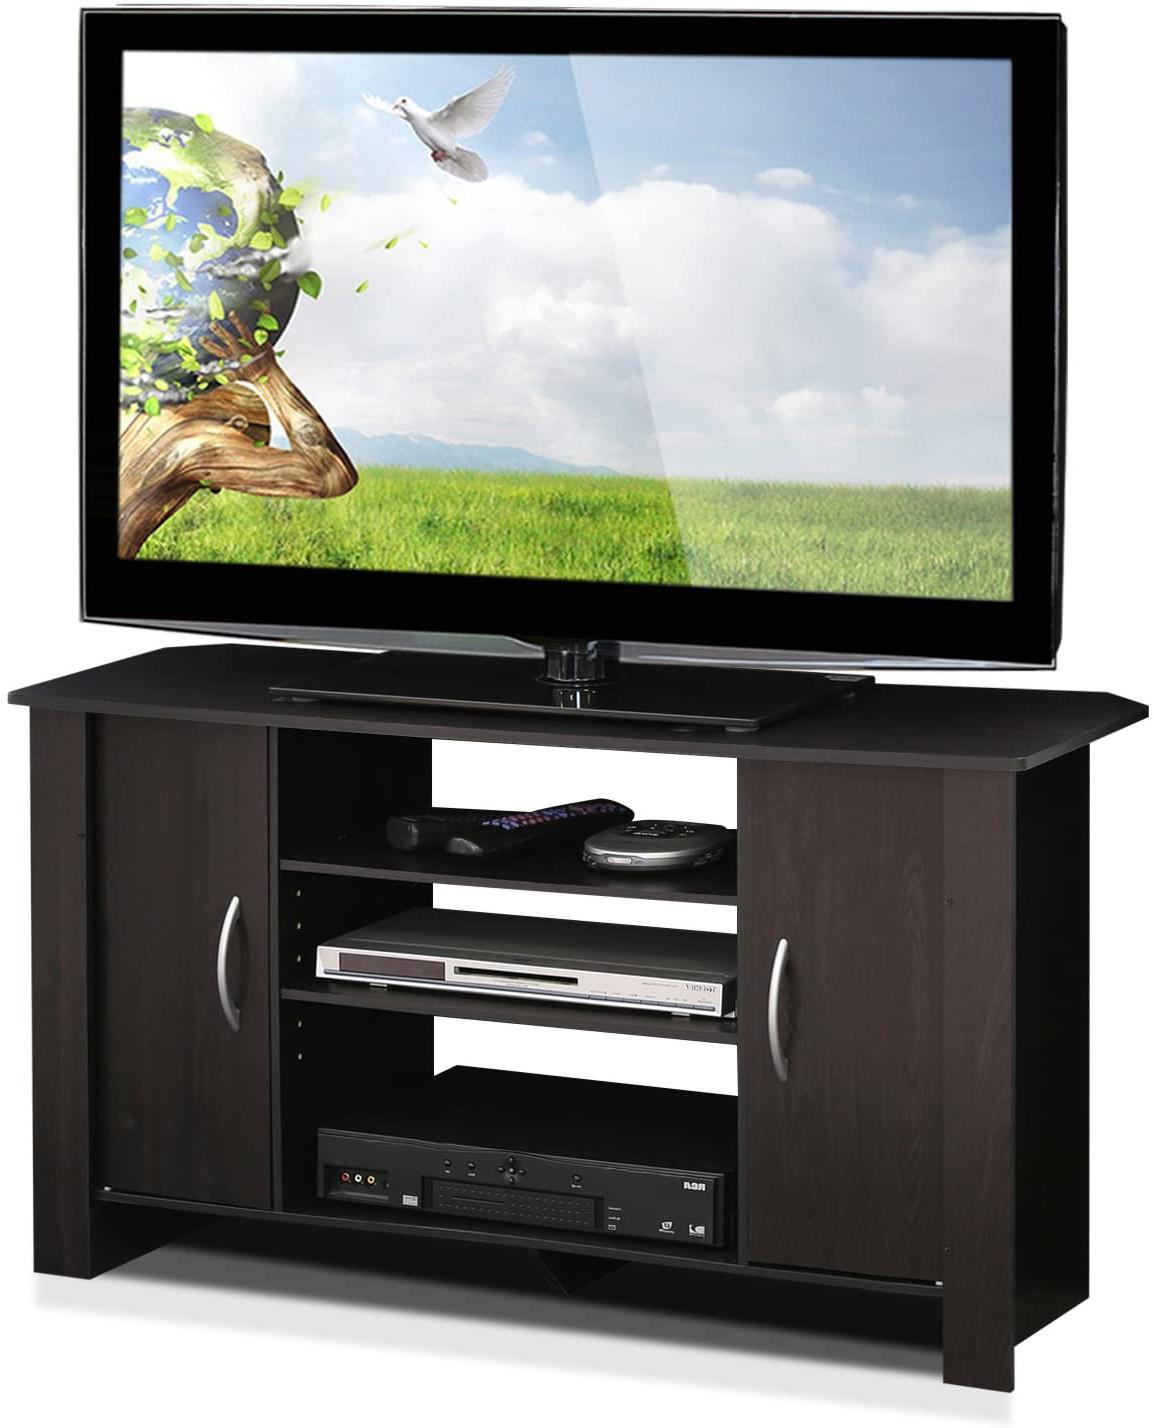 Furinno Econ TV Stand Entertainment Center w/ Storage Space